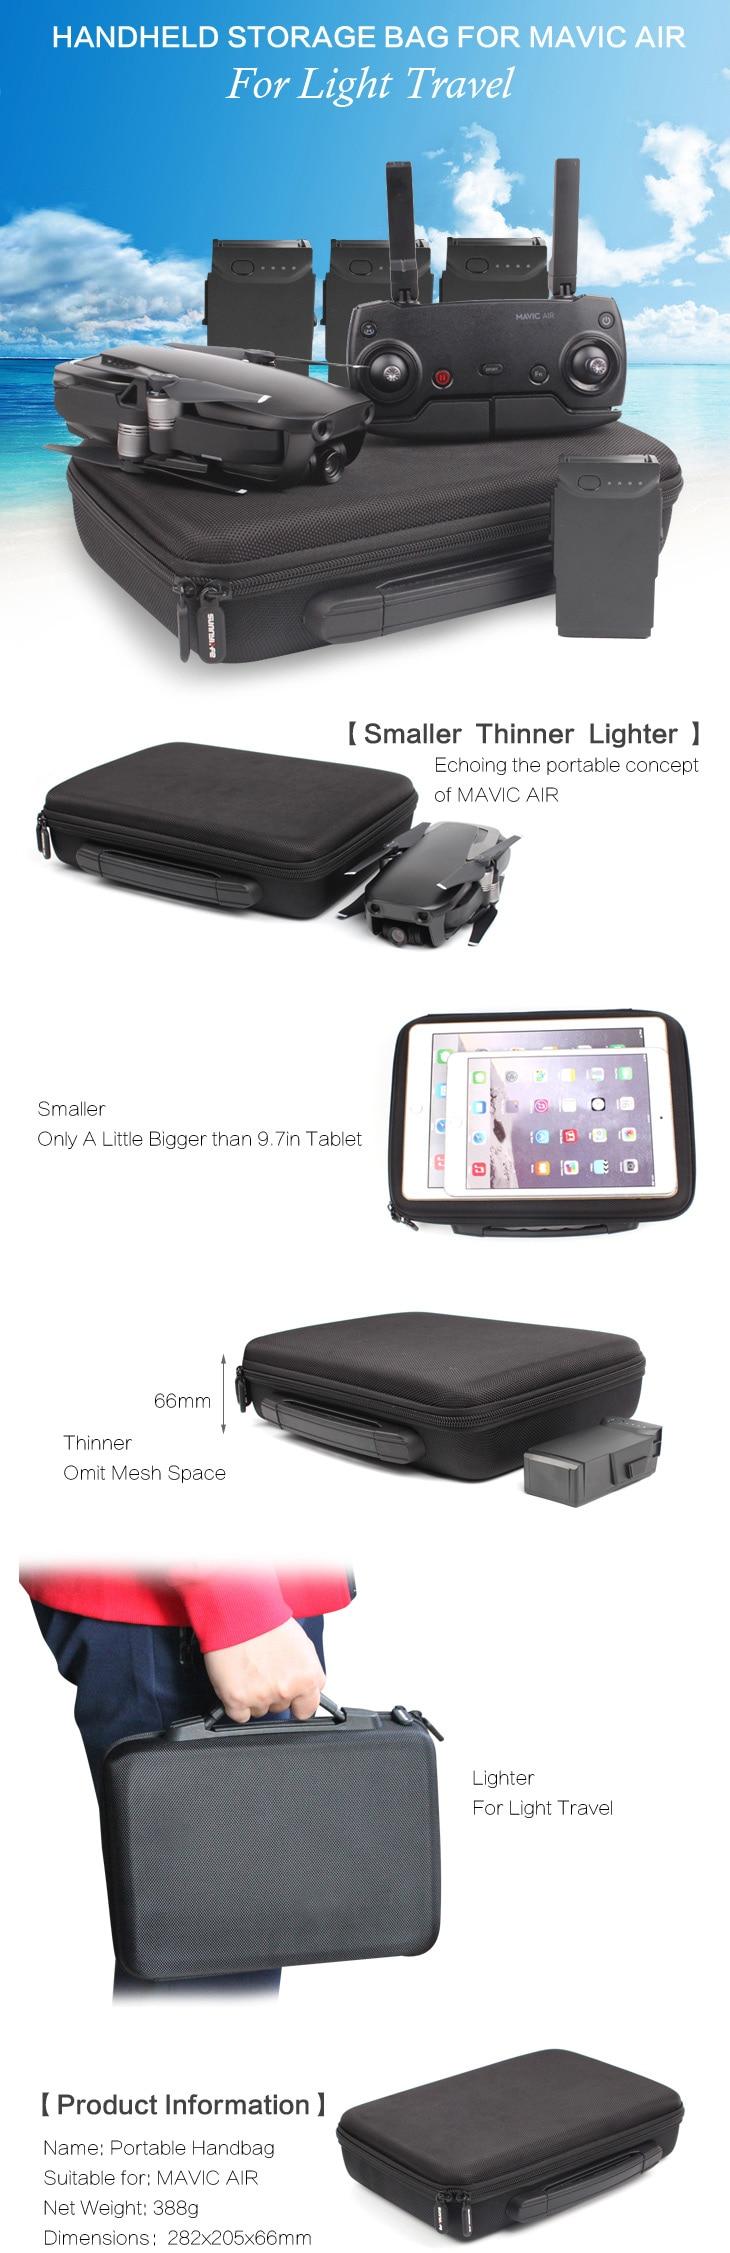 Sunnylife Storage Bag Portable Carrying Case Handbag For DJI MAVIC